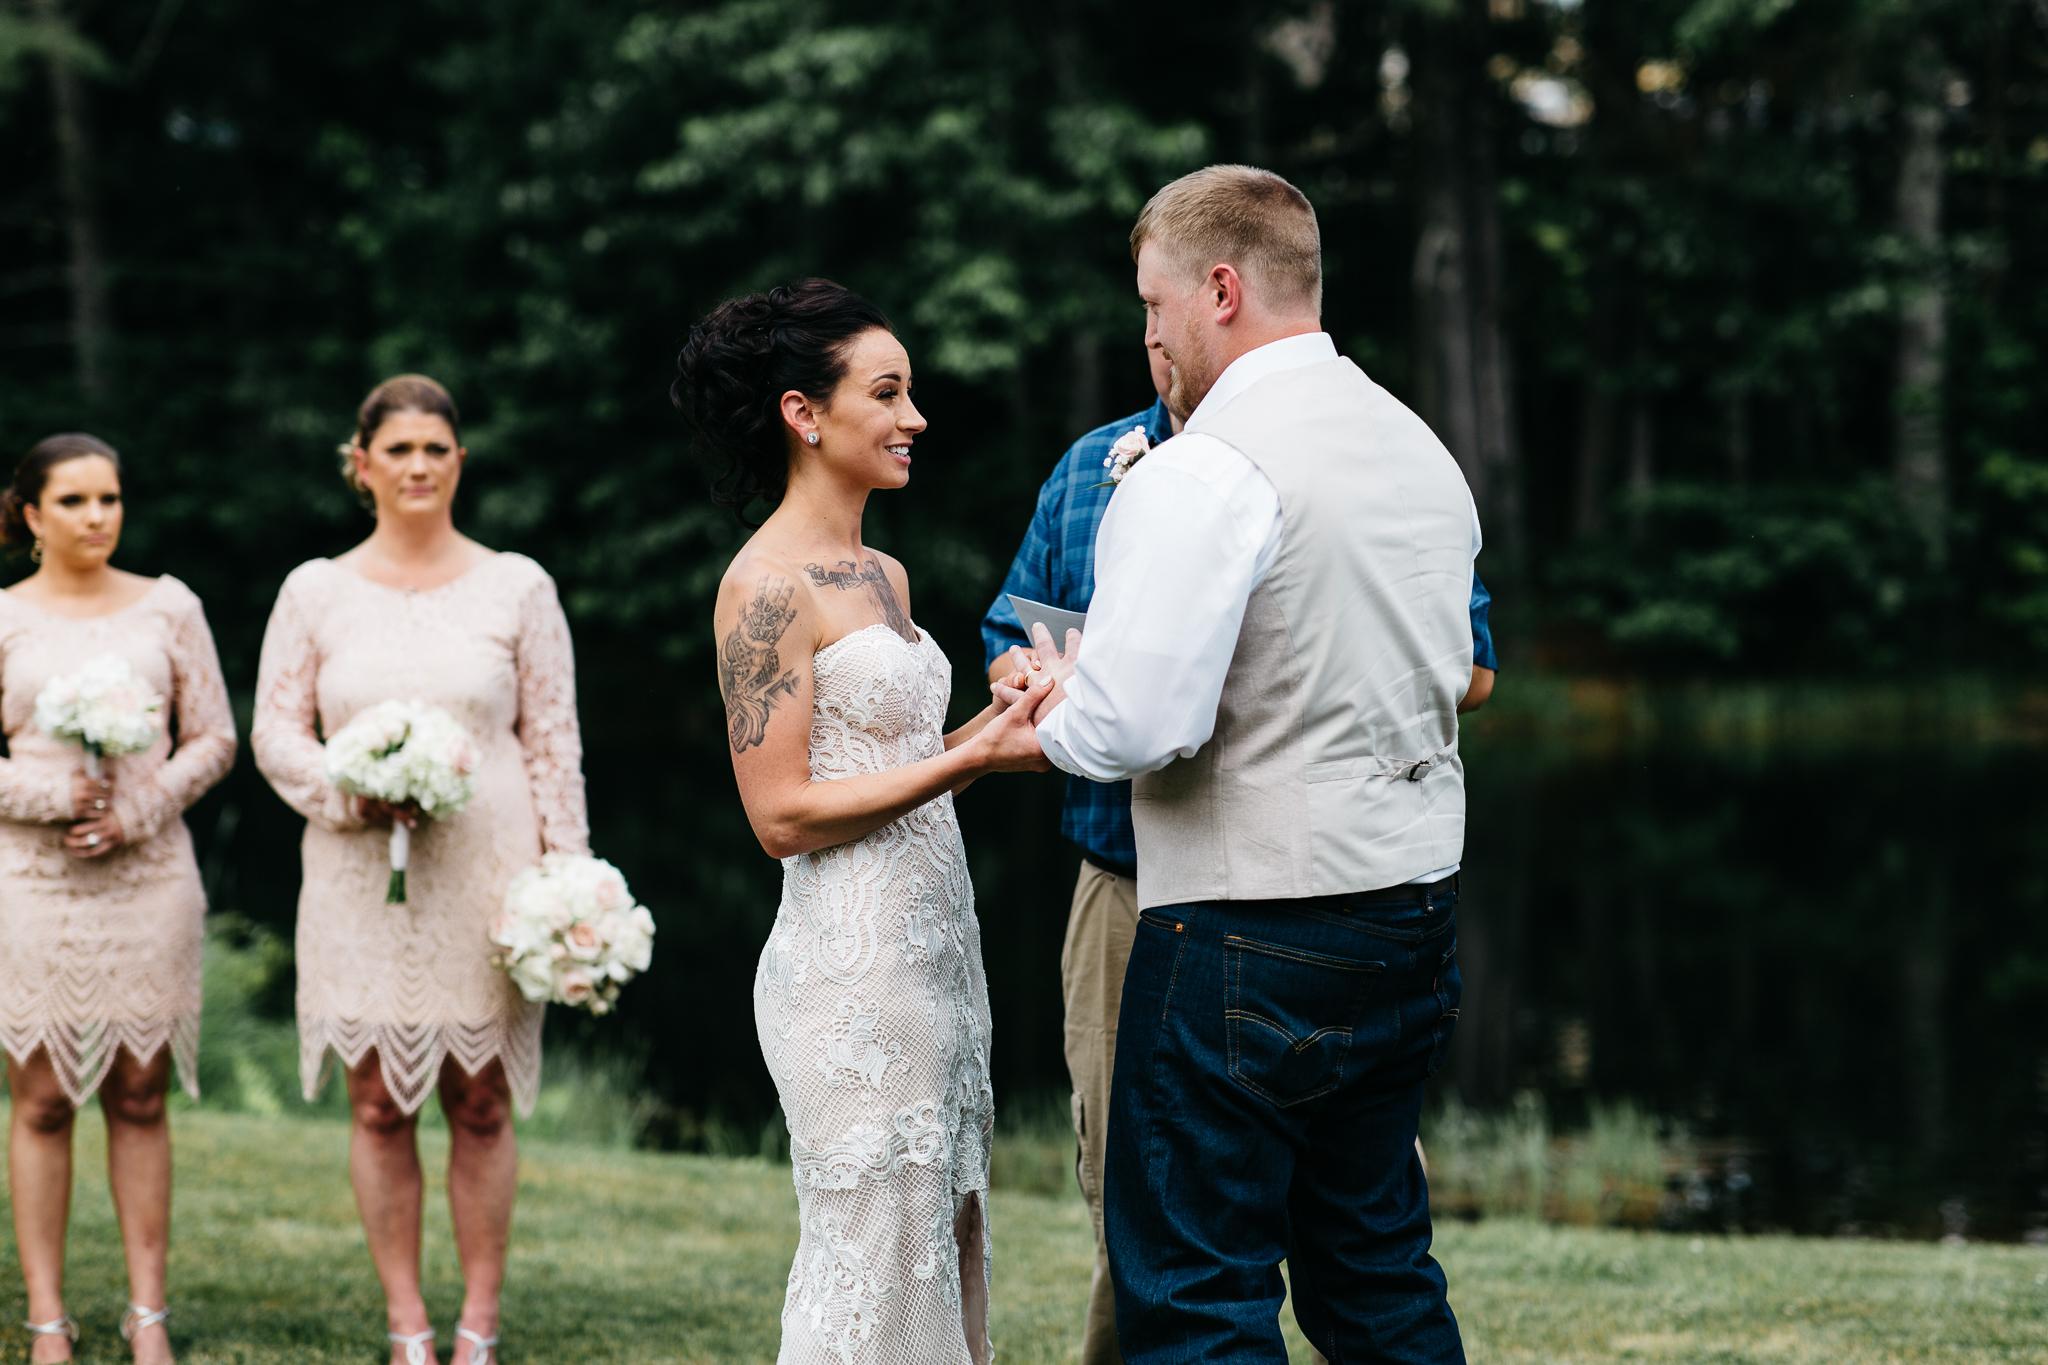 maine-wedding-couple-bride-groom-photography.jpg